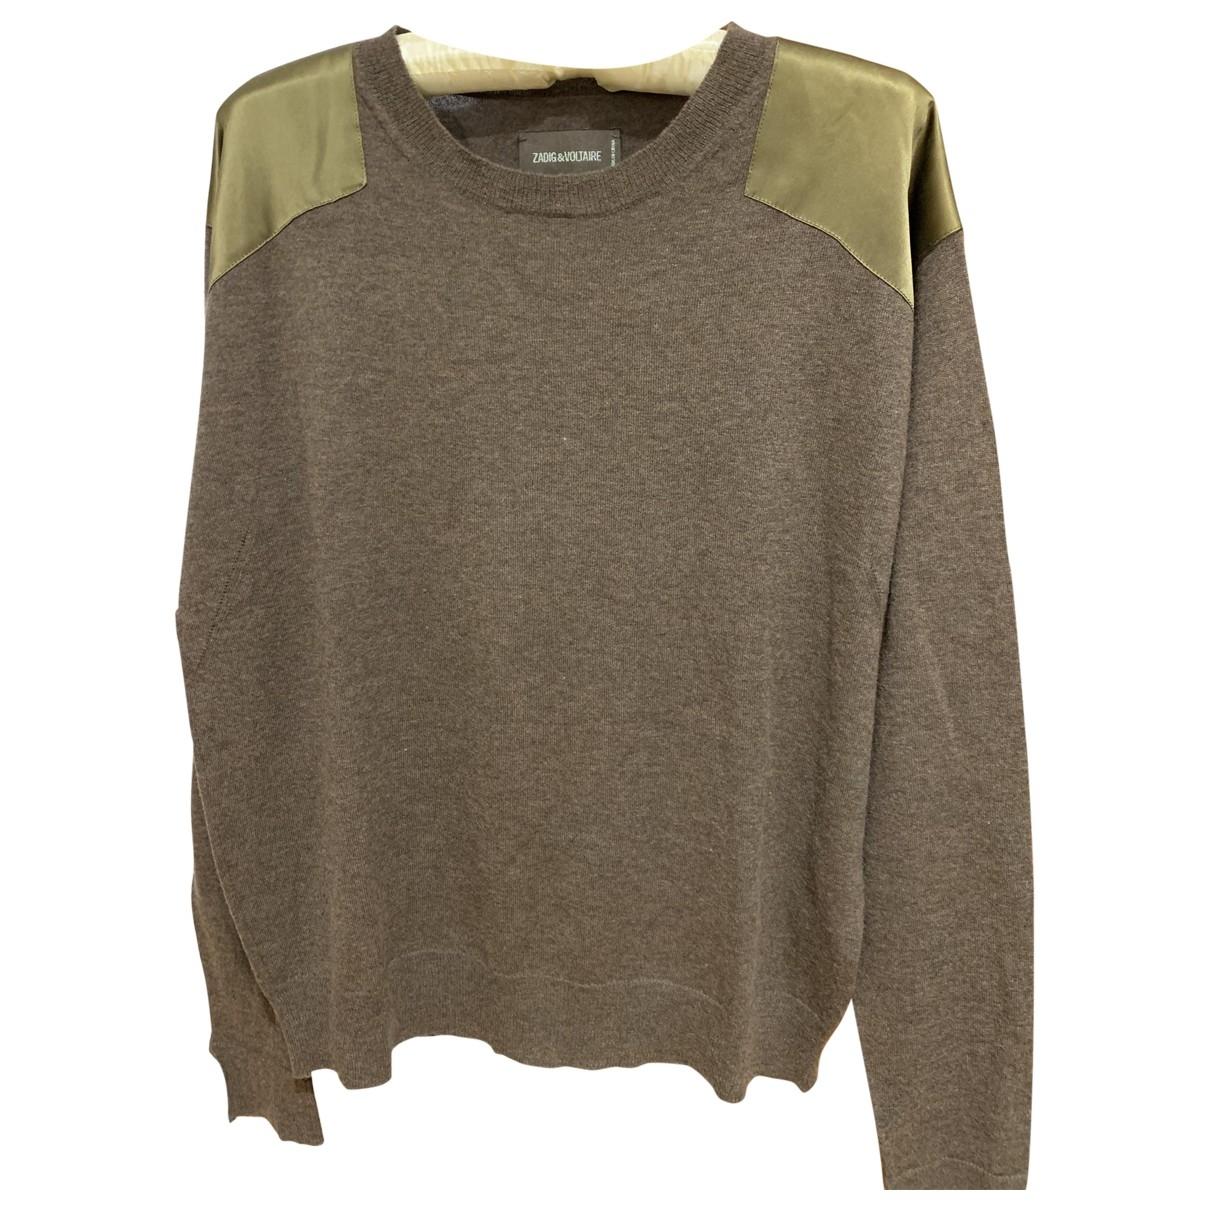 Zadig & Voltaire \N Green Cashmere Knitwear for Women S International